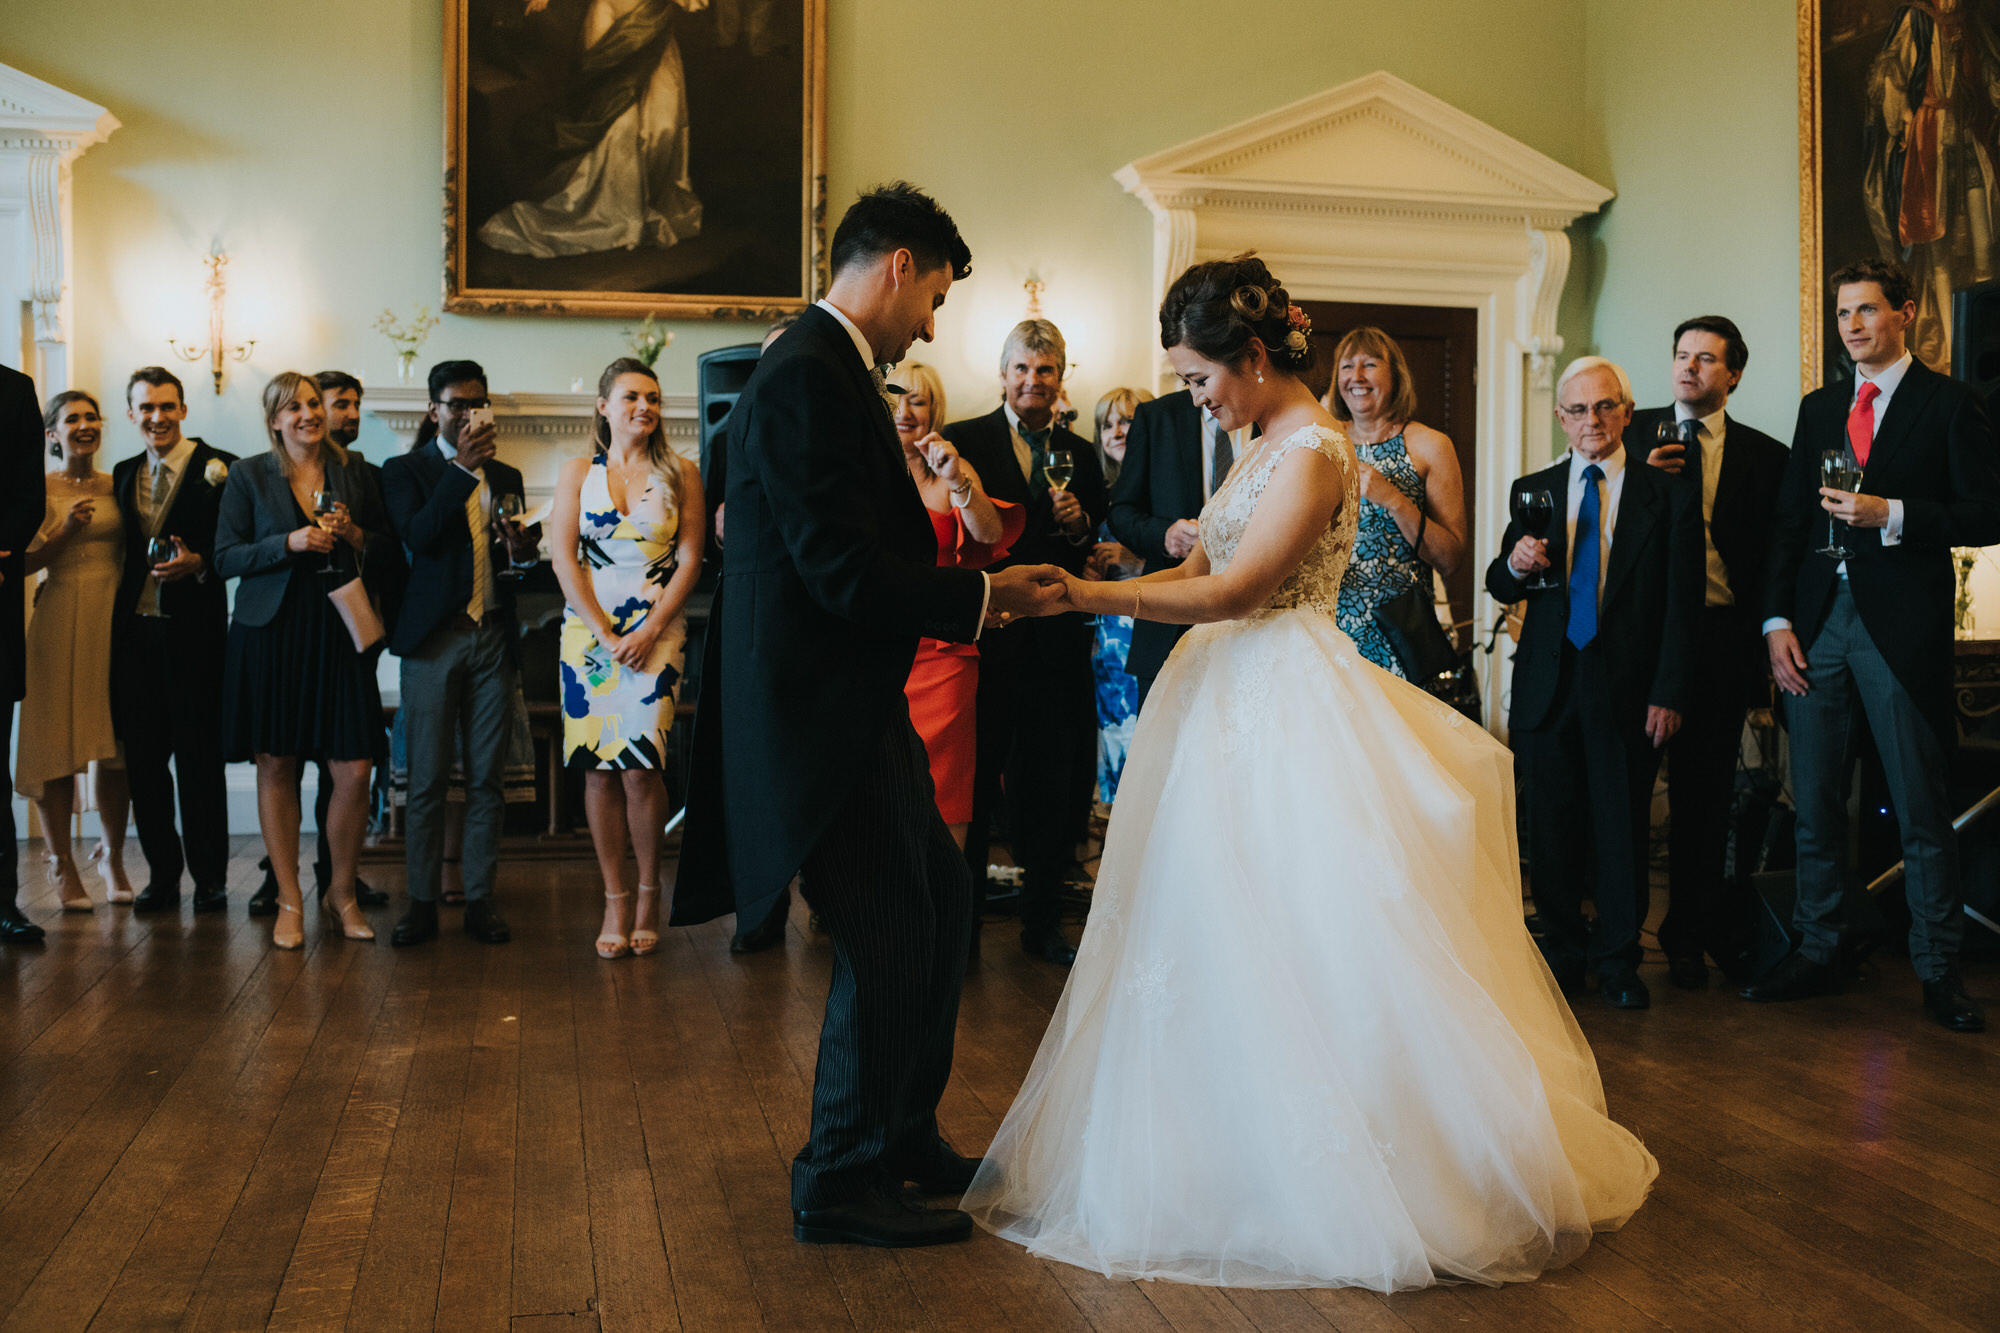 First dance Kirtlington park wedding